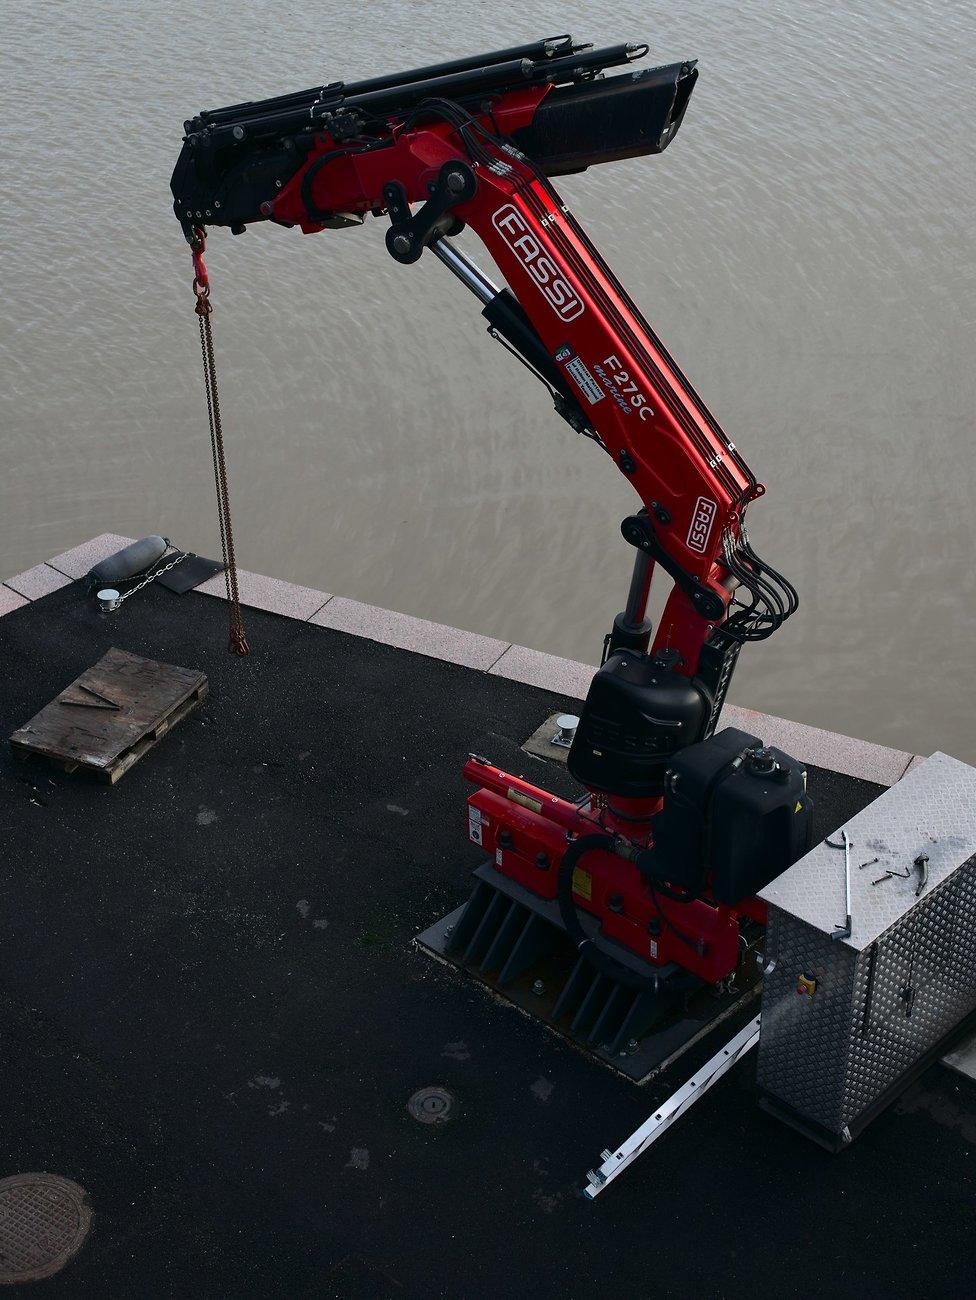 2020-02-23-09-11-MP004196.jpg